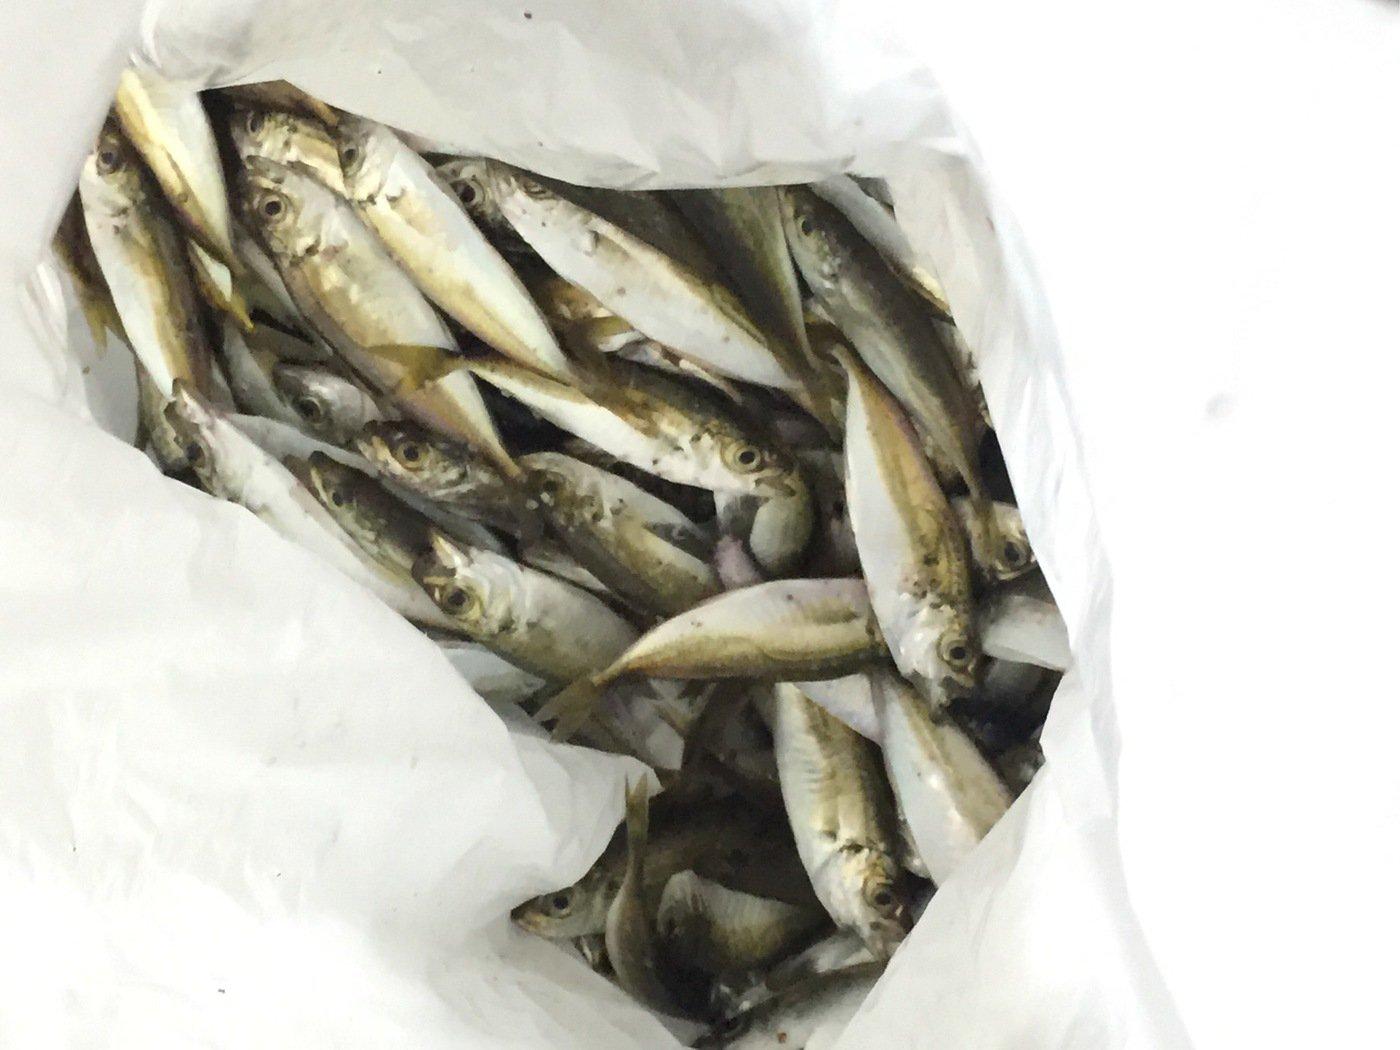 trumpeterhiro さんの投稿画像,写っている魚は